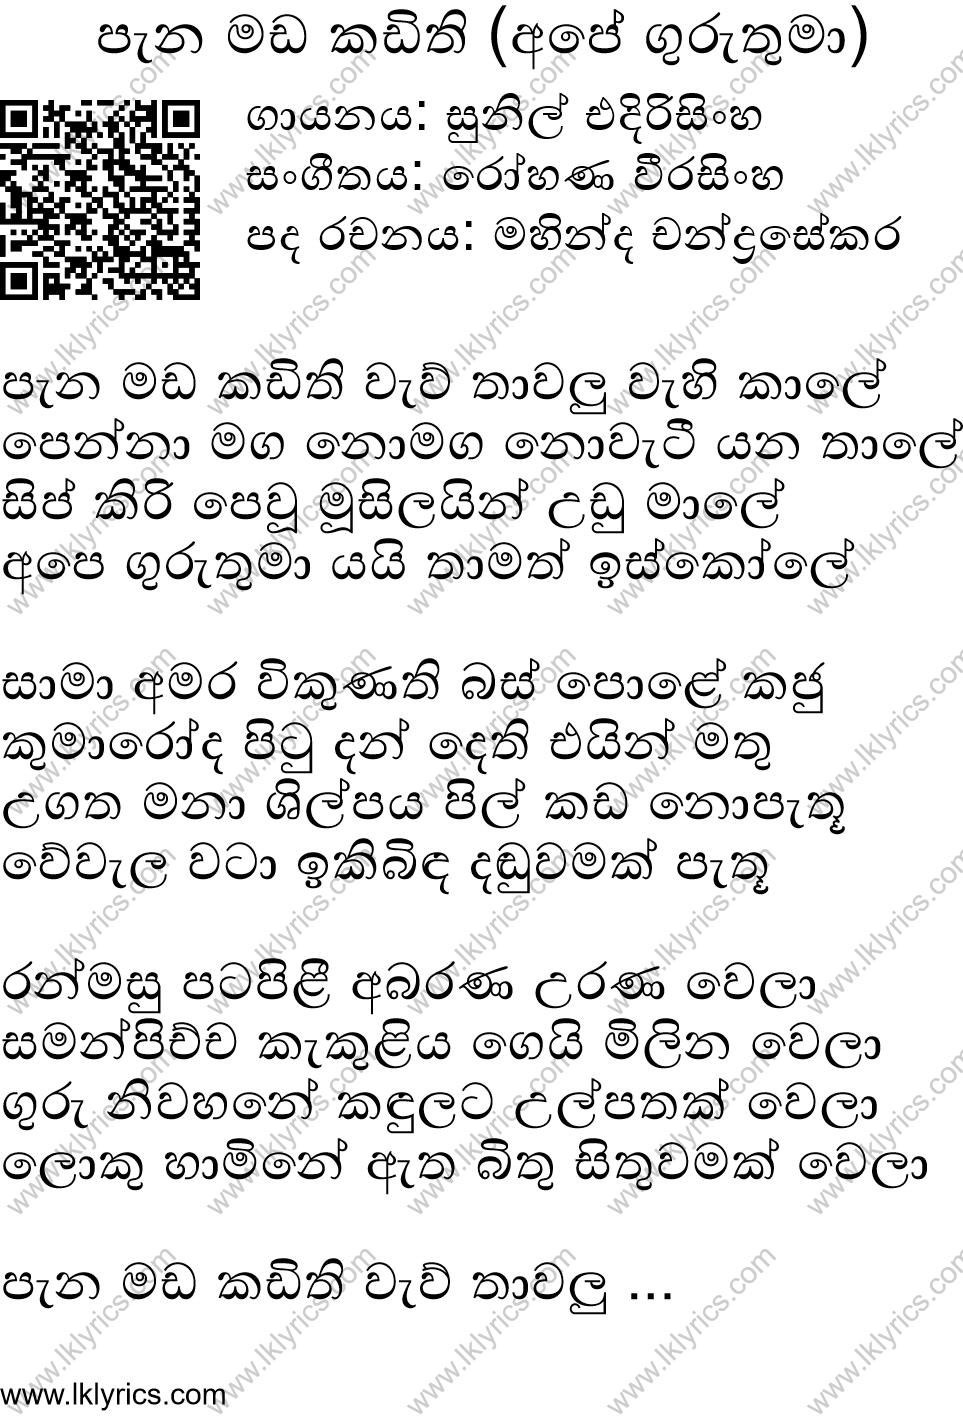 Pana Mada Kadithi Ape Guruthuma Lyrics Lk Lyrics Shimada bros entertainment presents new song. pana mada kadithi ape guruthuma